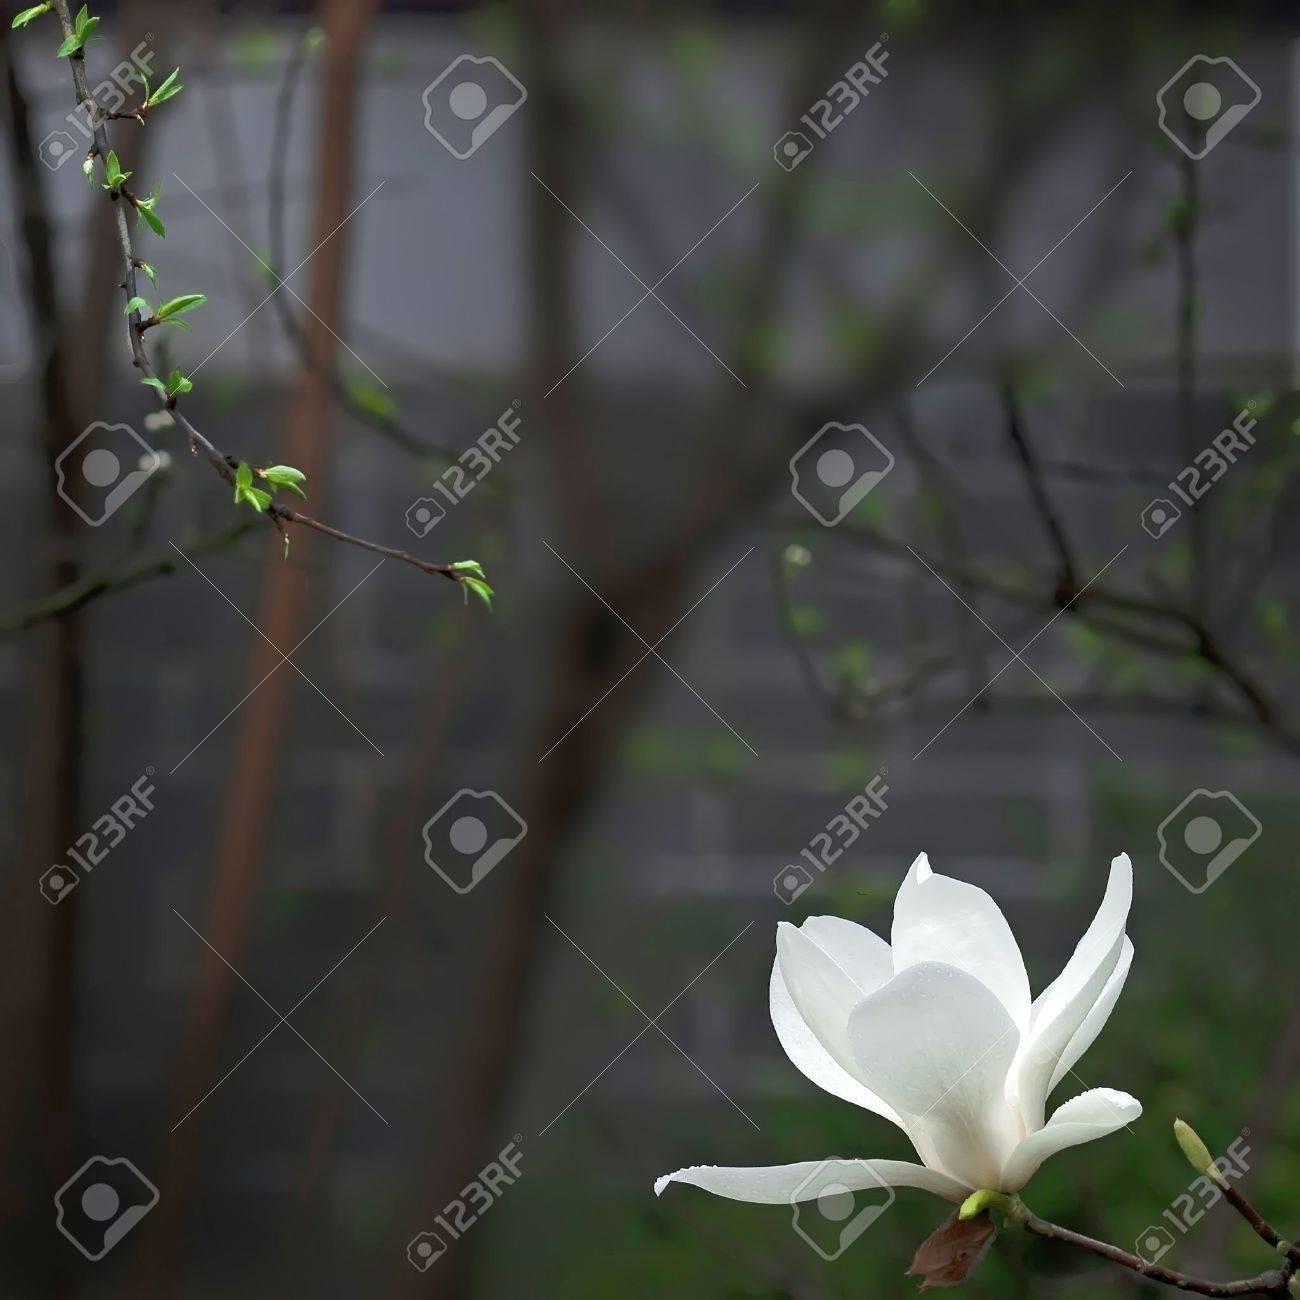 A Beautiful White Magnolia Flower With Fresh Odor Stock Photo